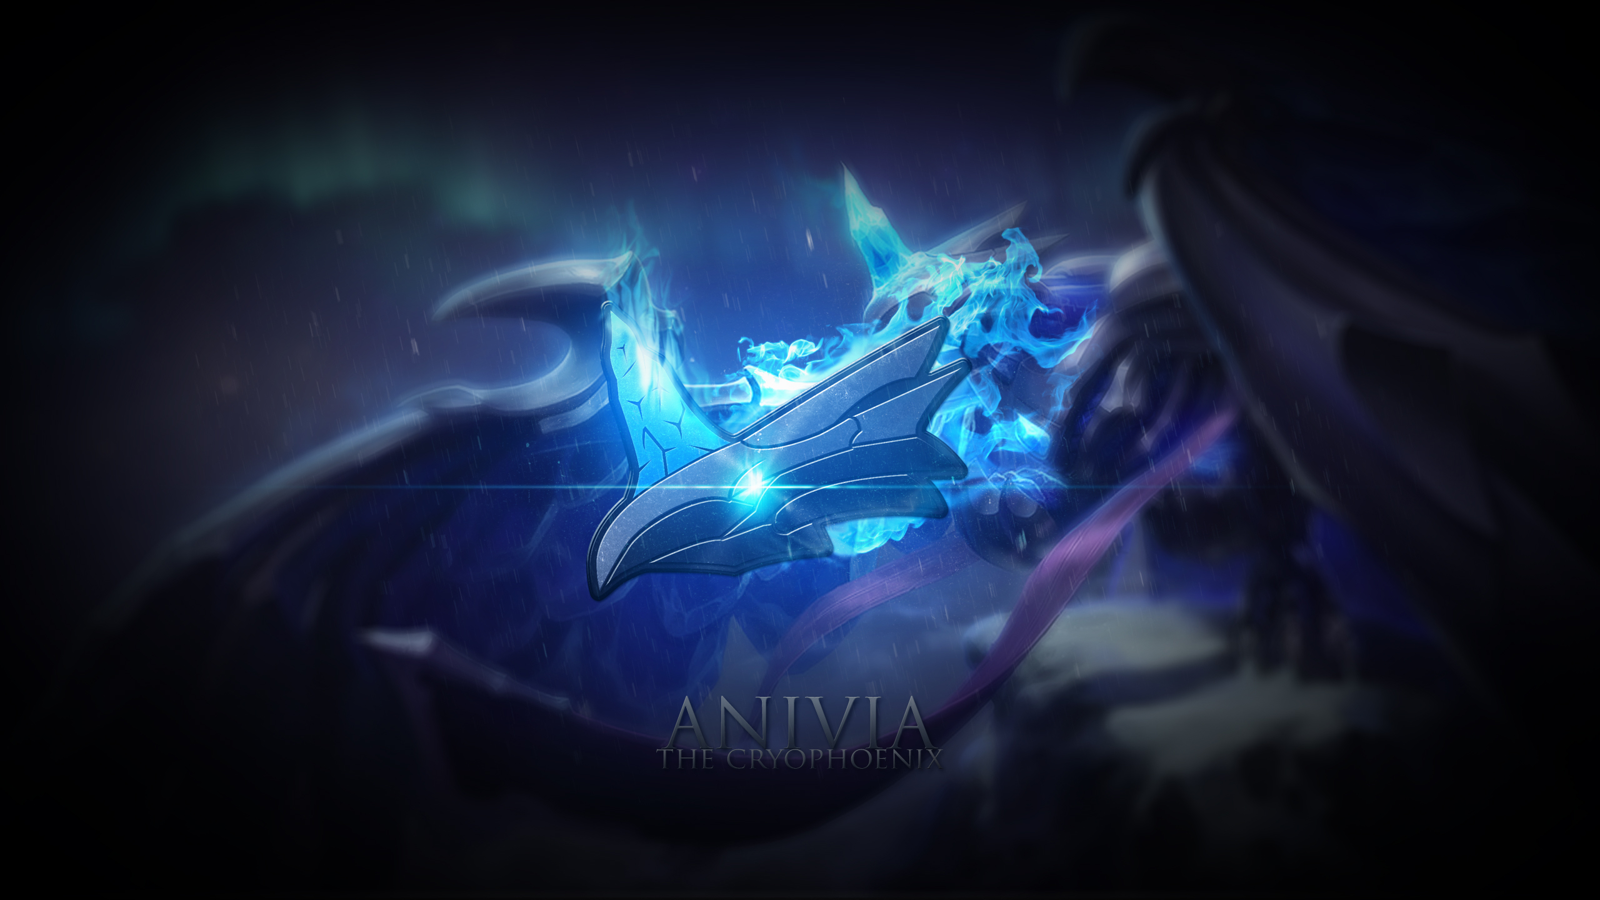 Anivia League Of Legends Wallpapers HD 1920x1080